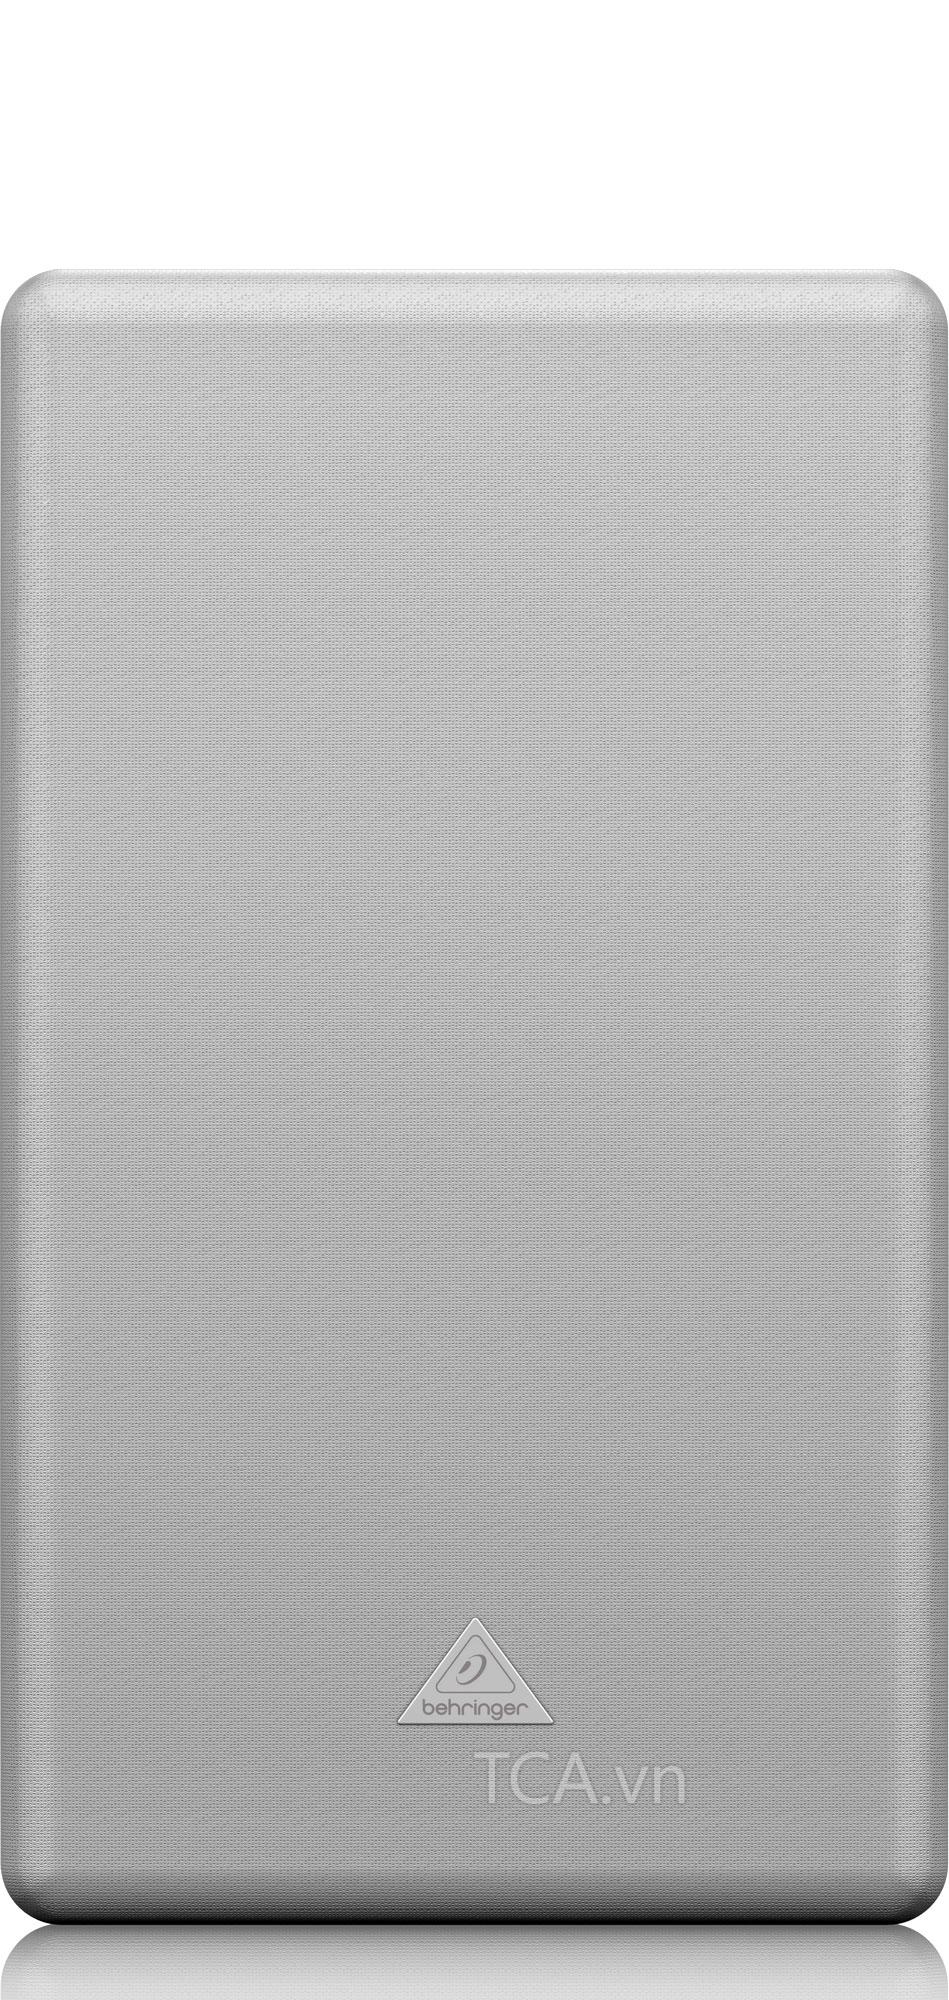 LOA Behringer EUROCOM CL2596-WH